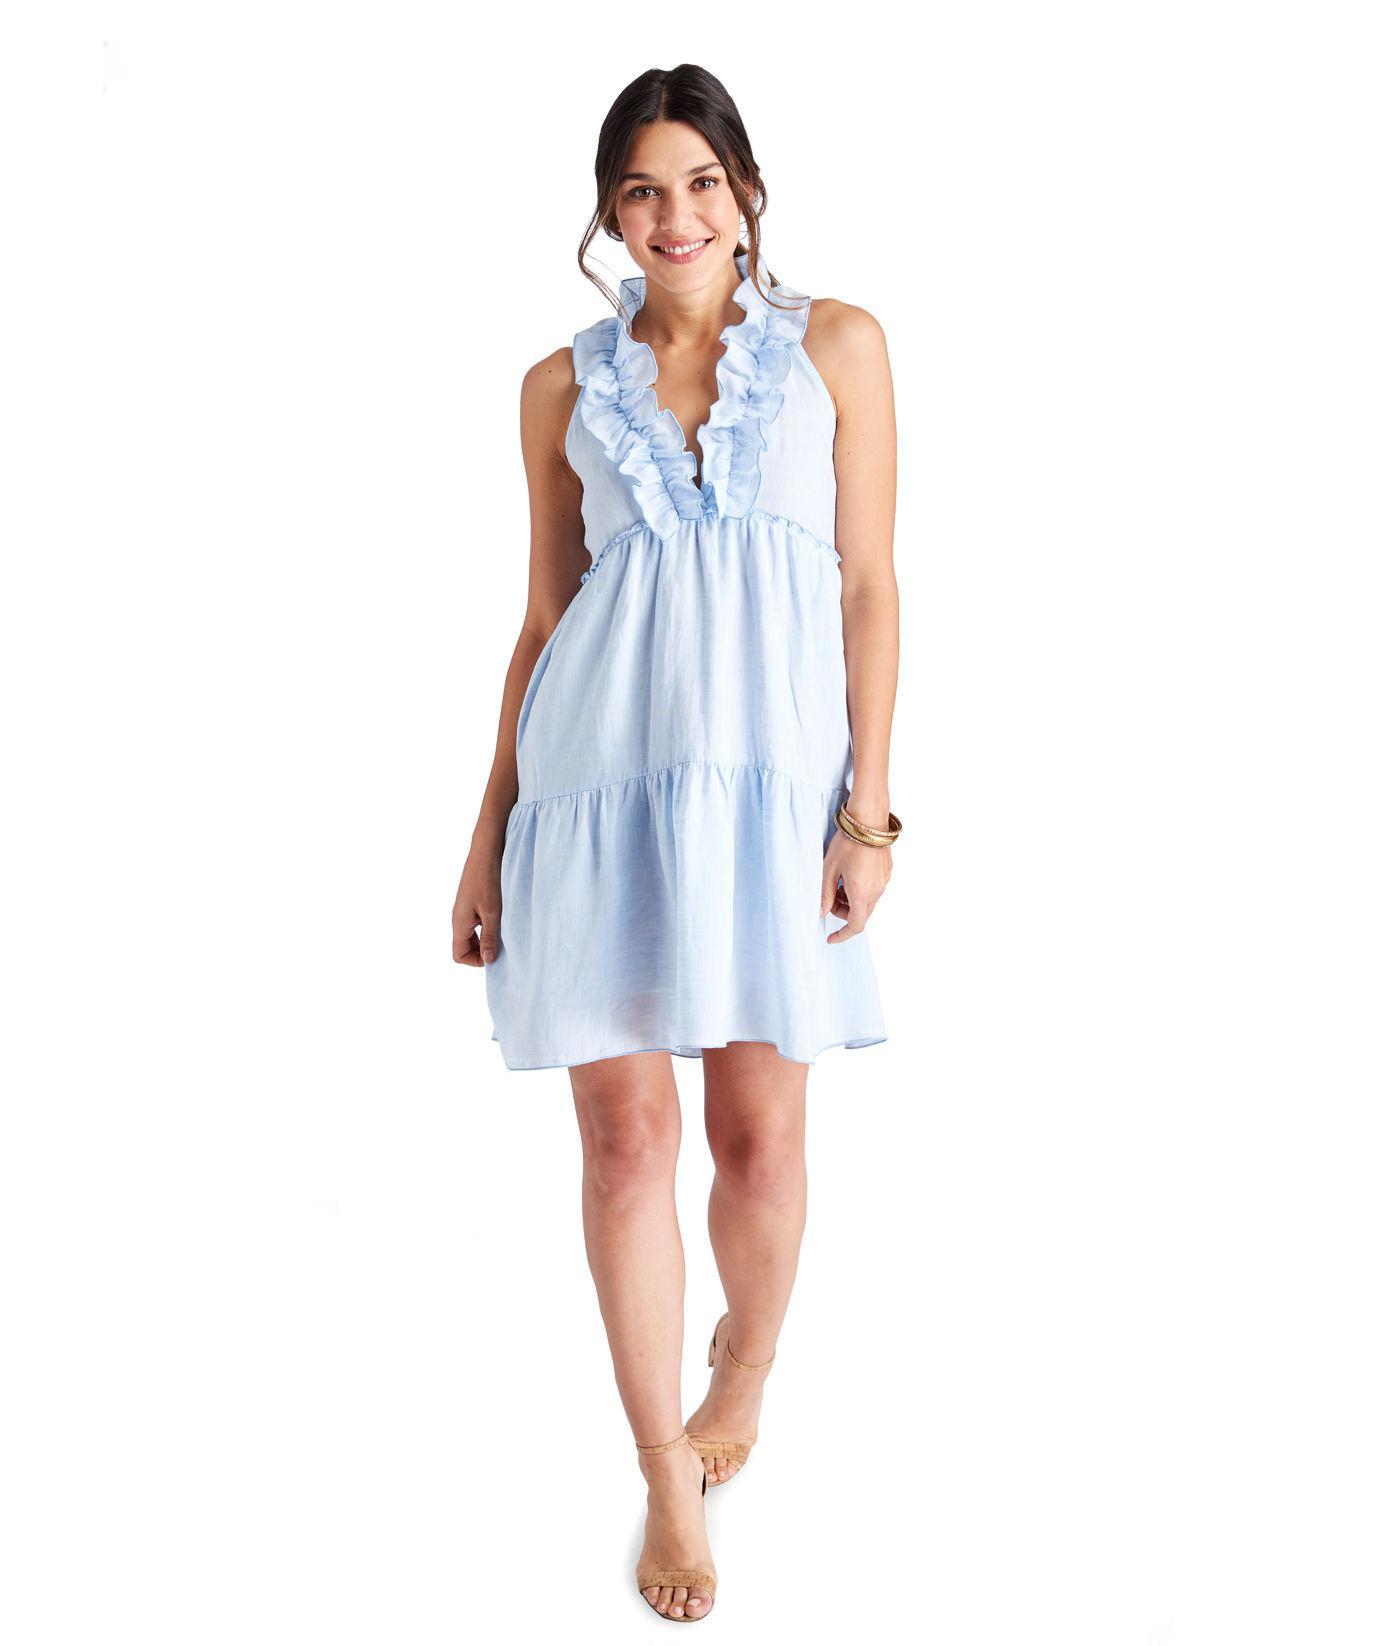 9b86afff5f Lyst - Vineyard Vines V-neck Ruffled Tiered Dress in Blue